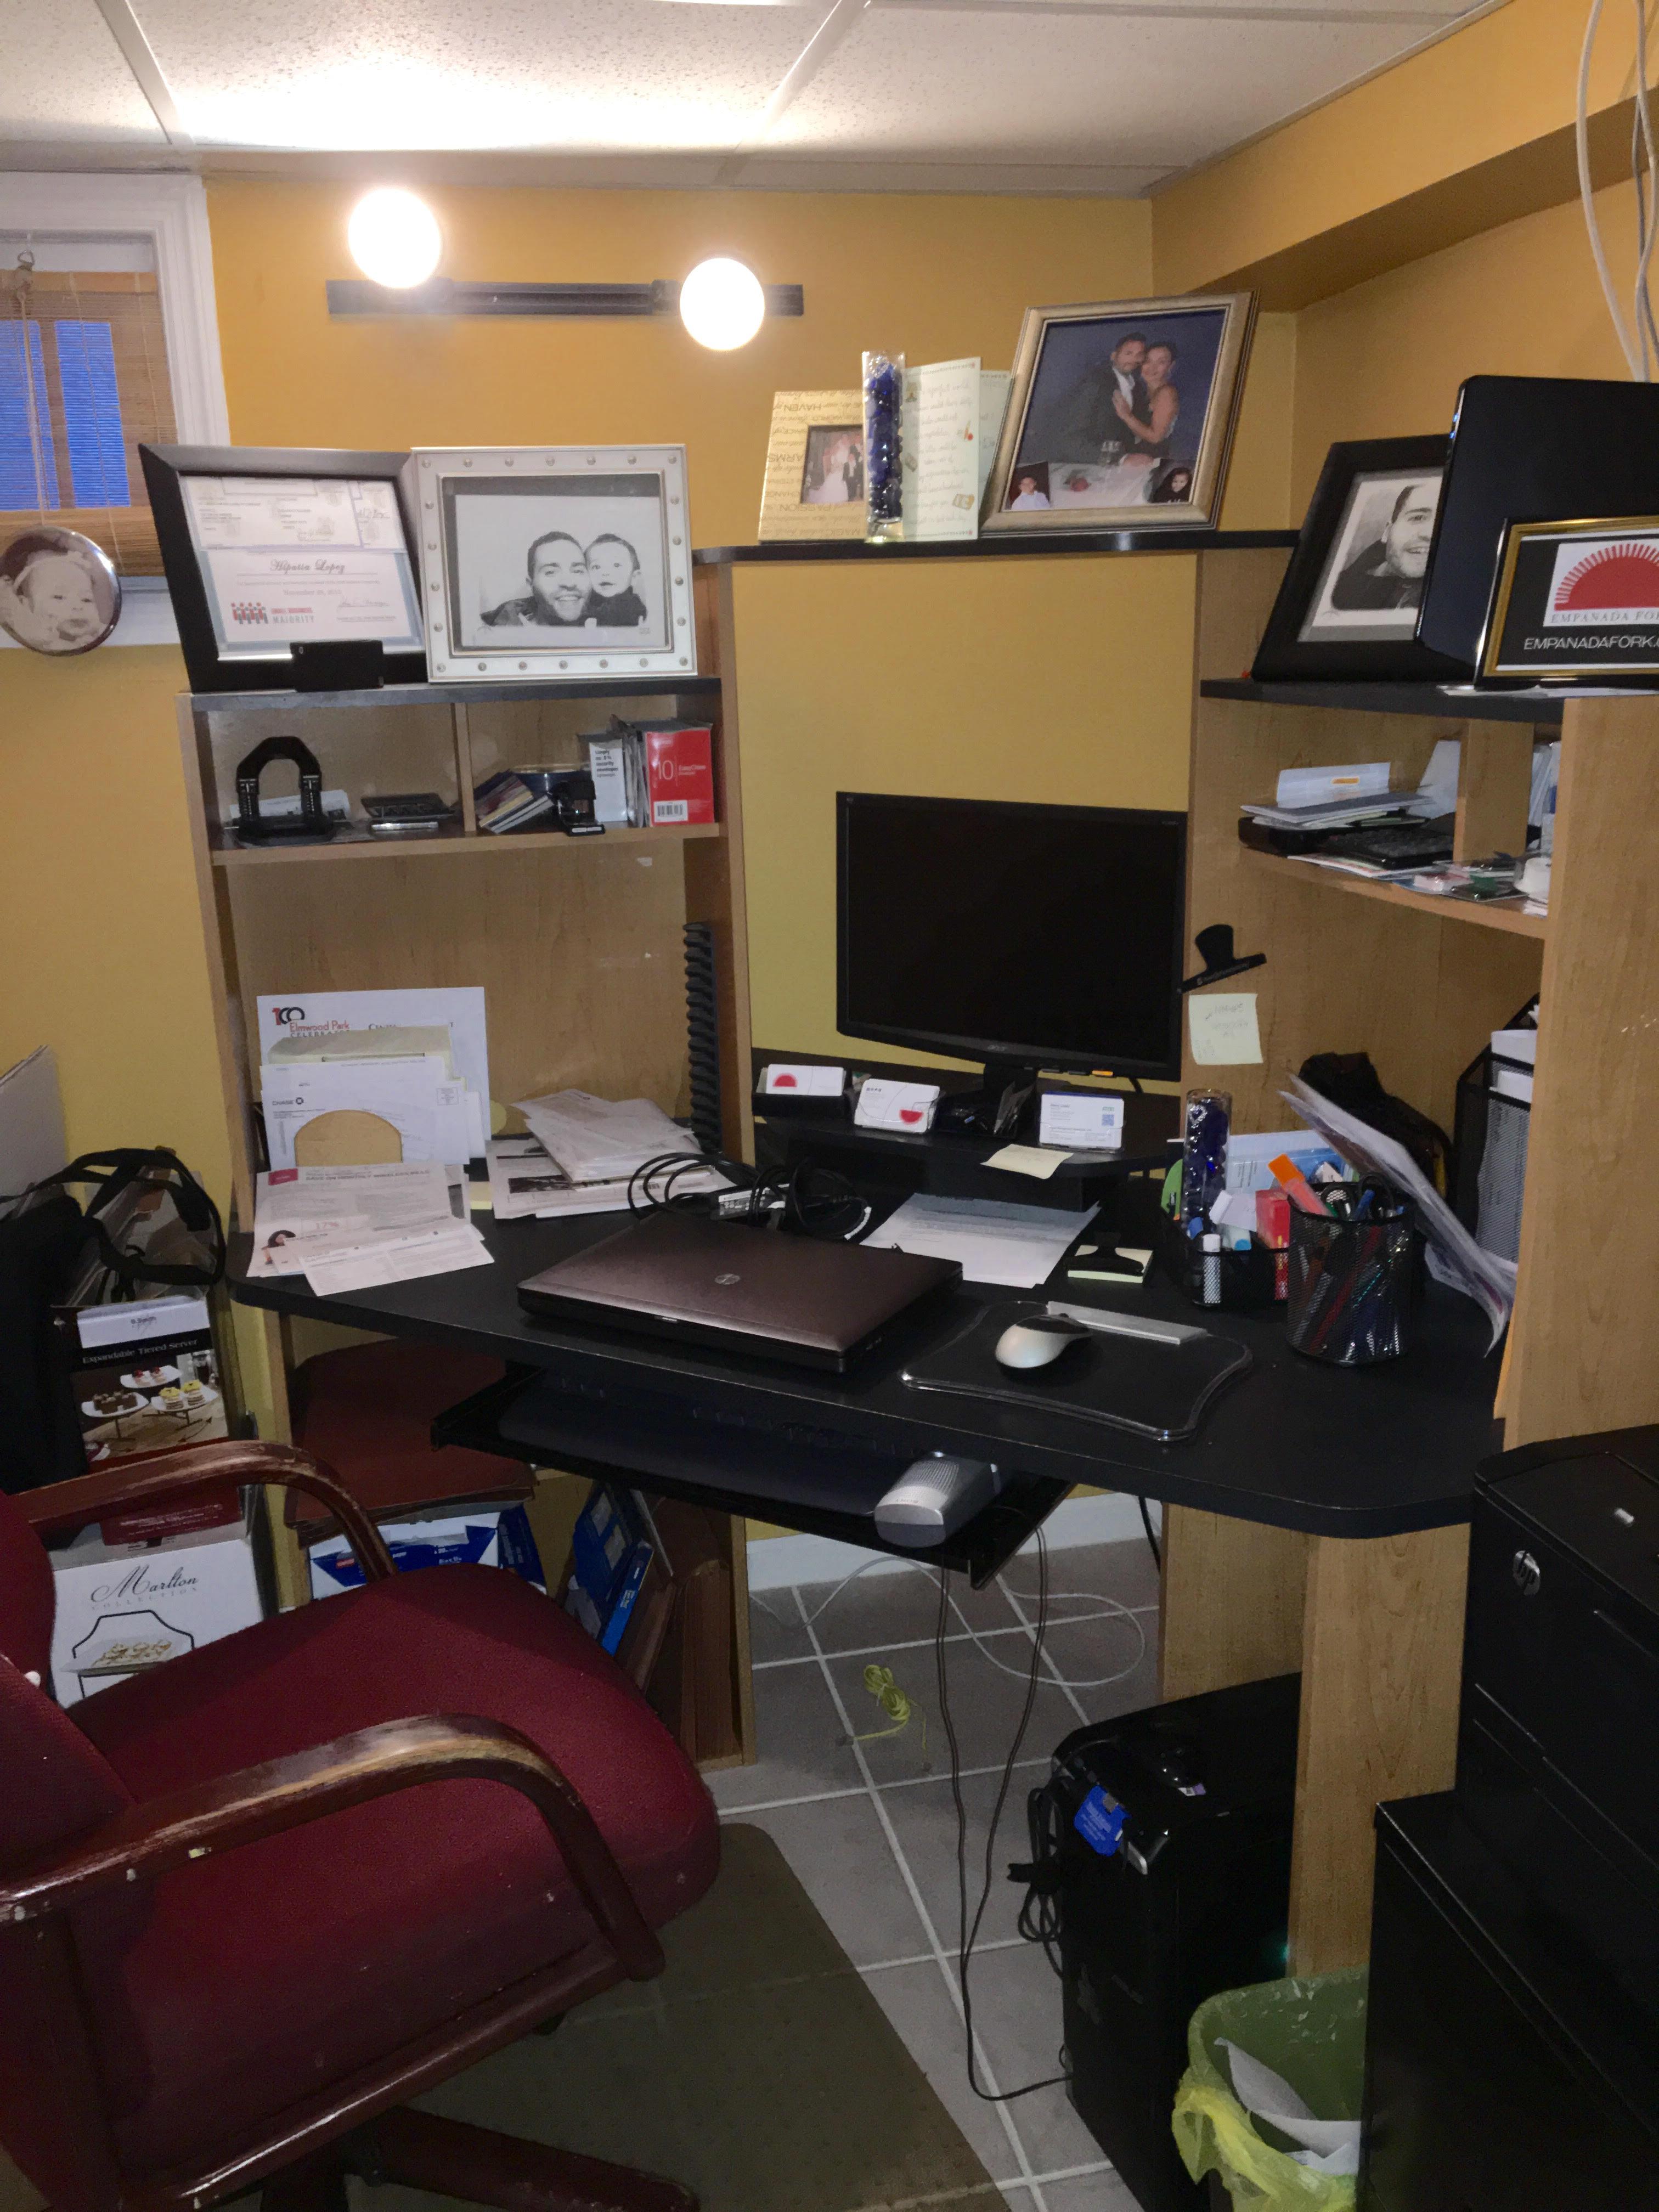 Top: Hipatia's Office